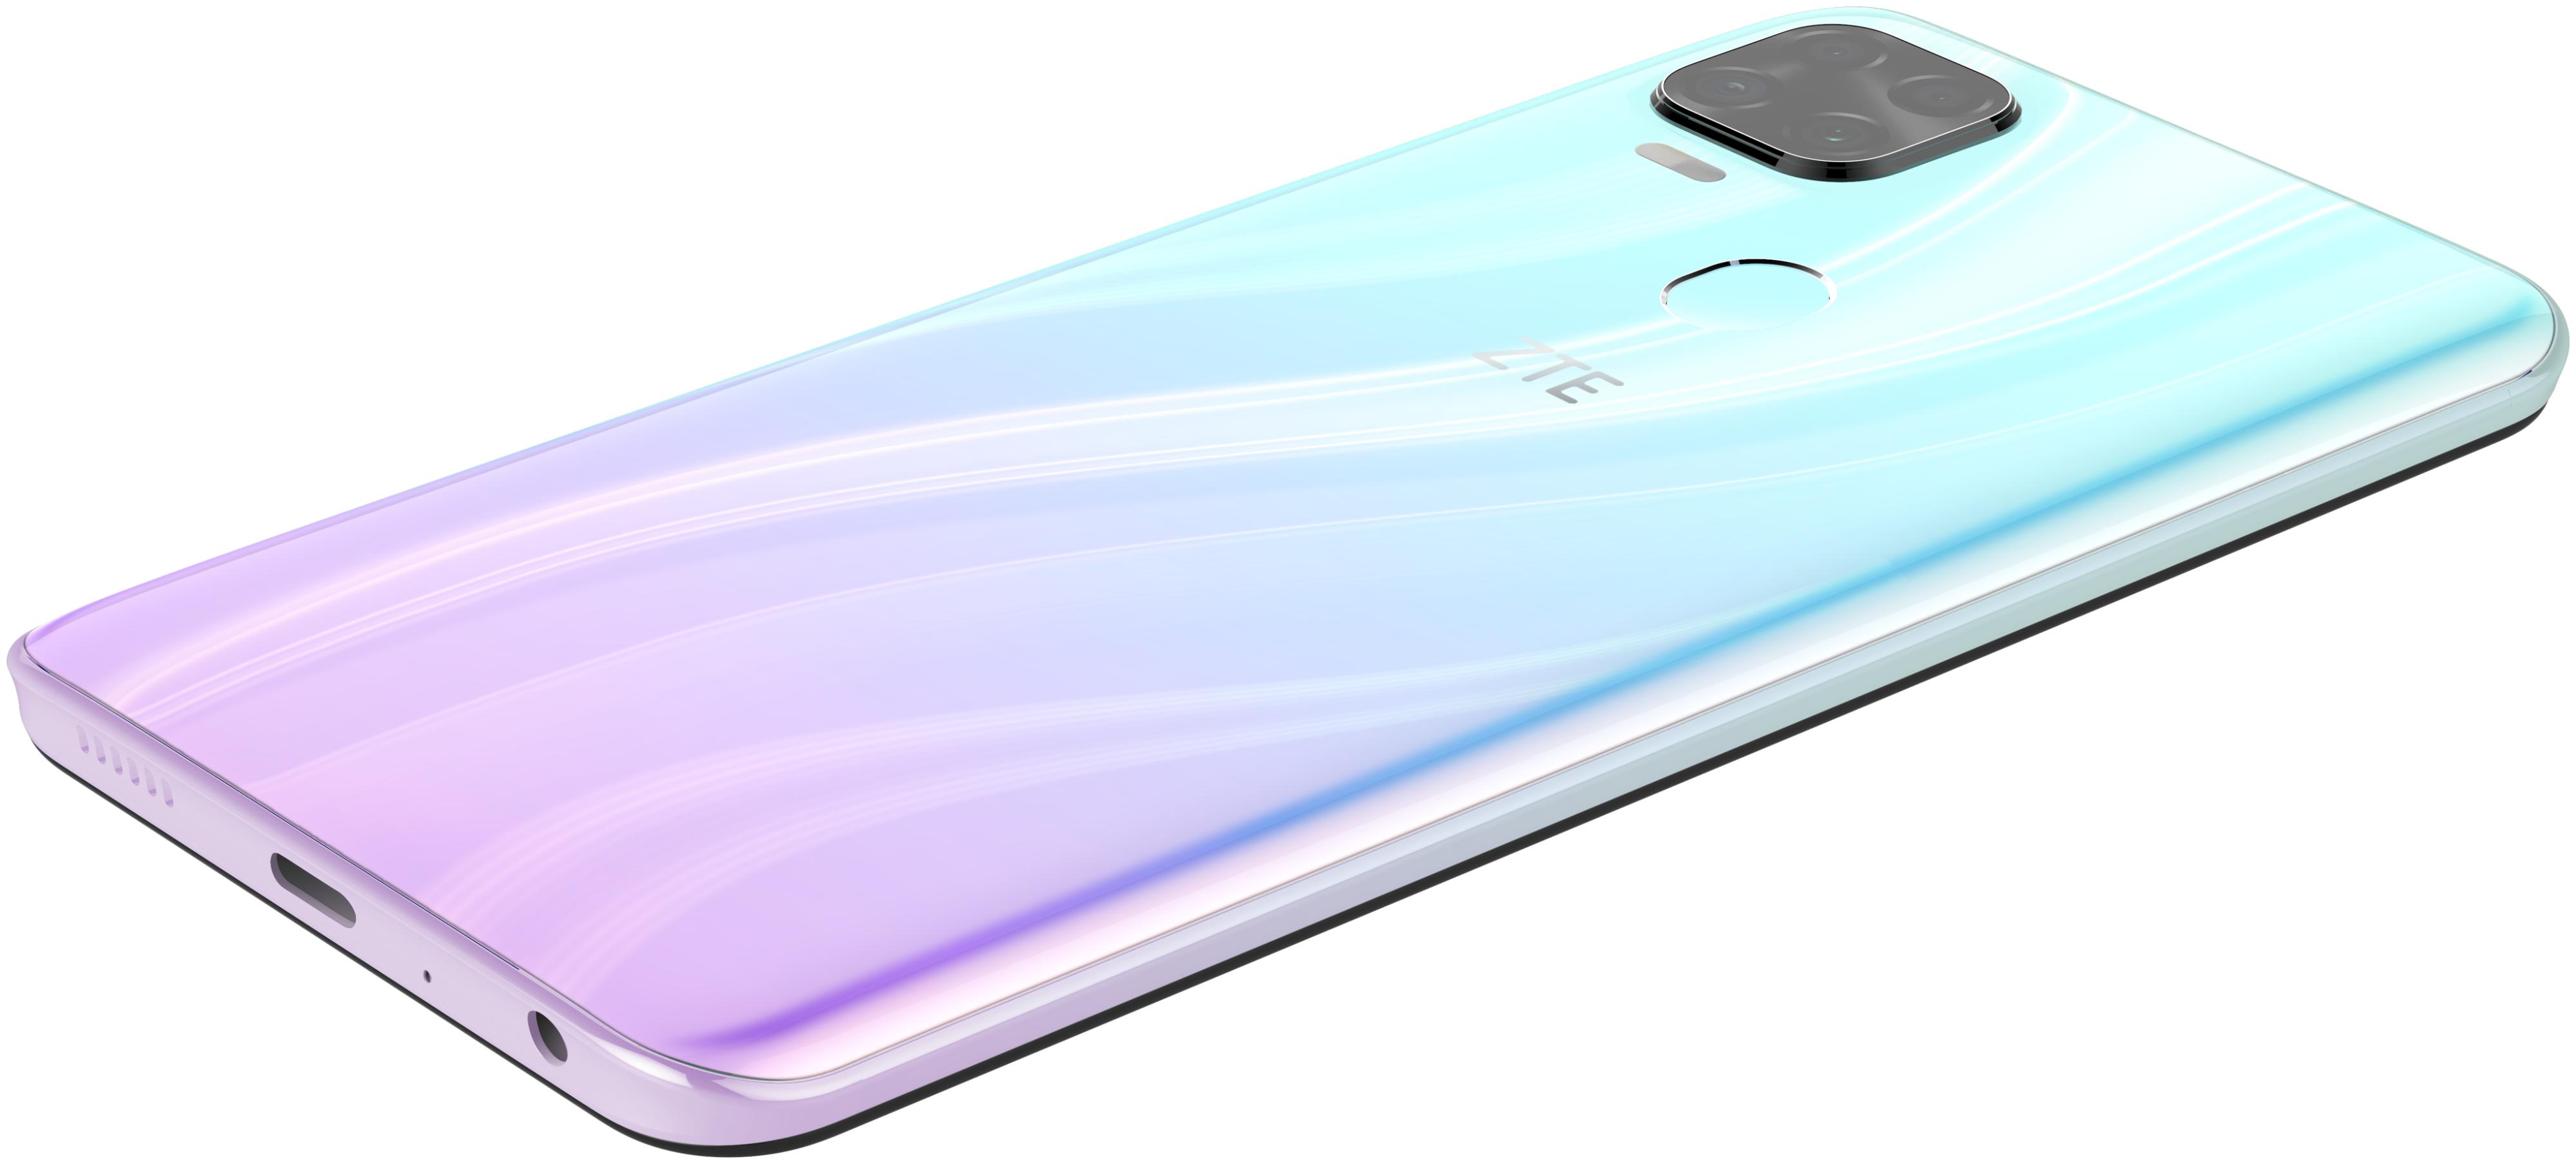 ZTE Blade V2020 - операционная система: Android 10